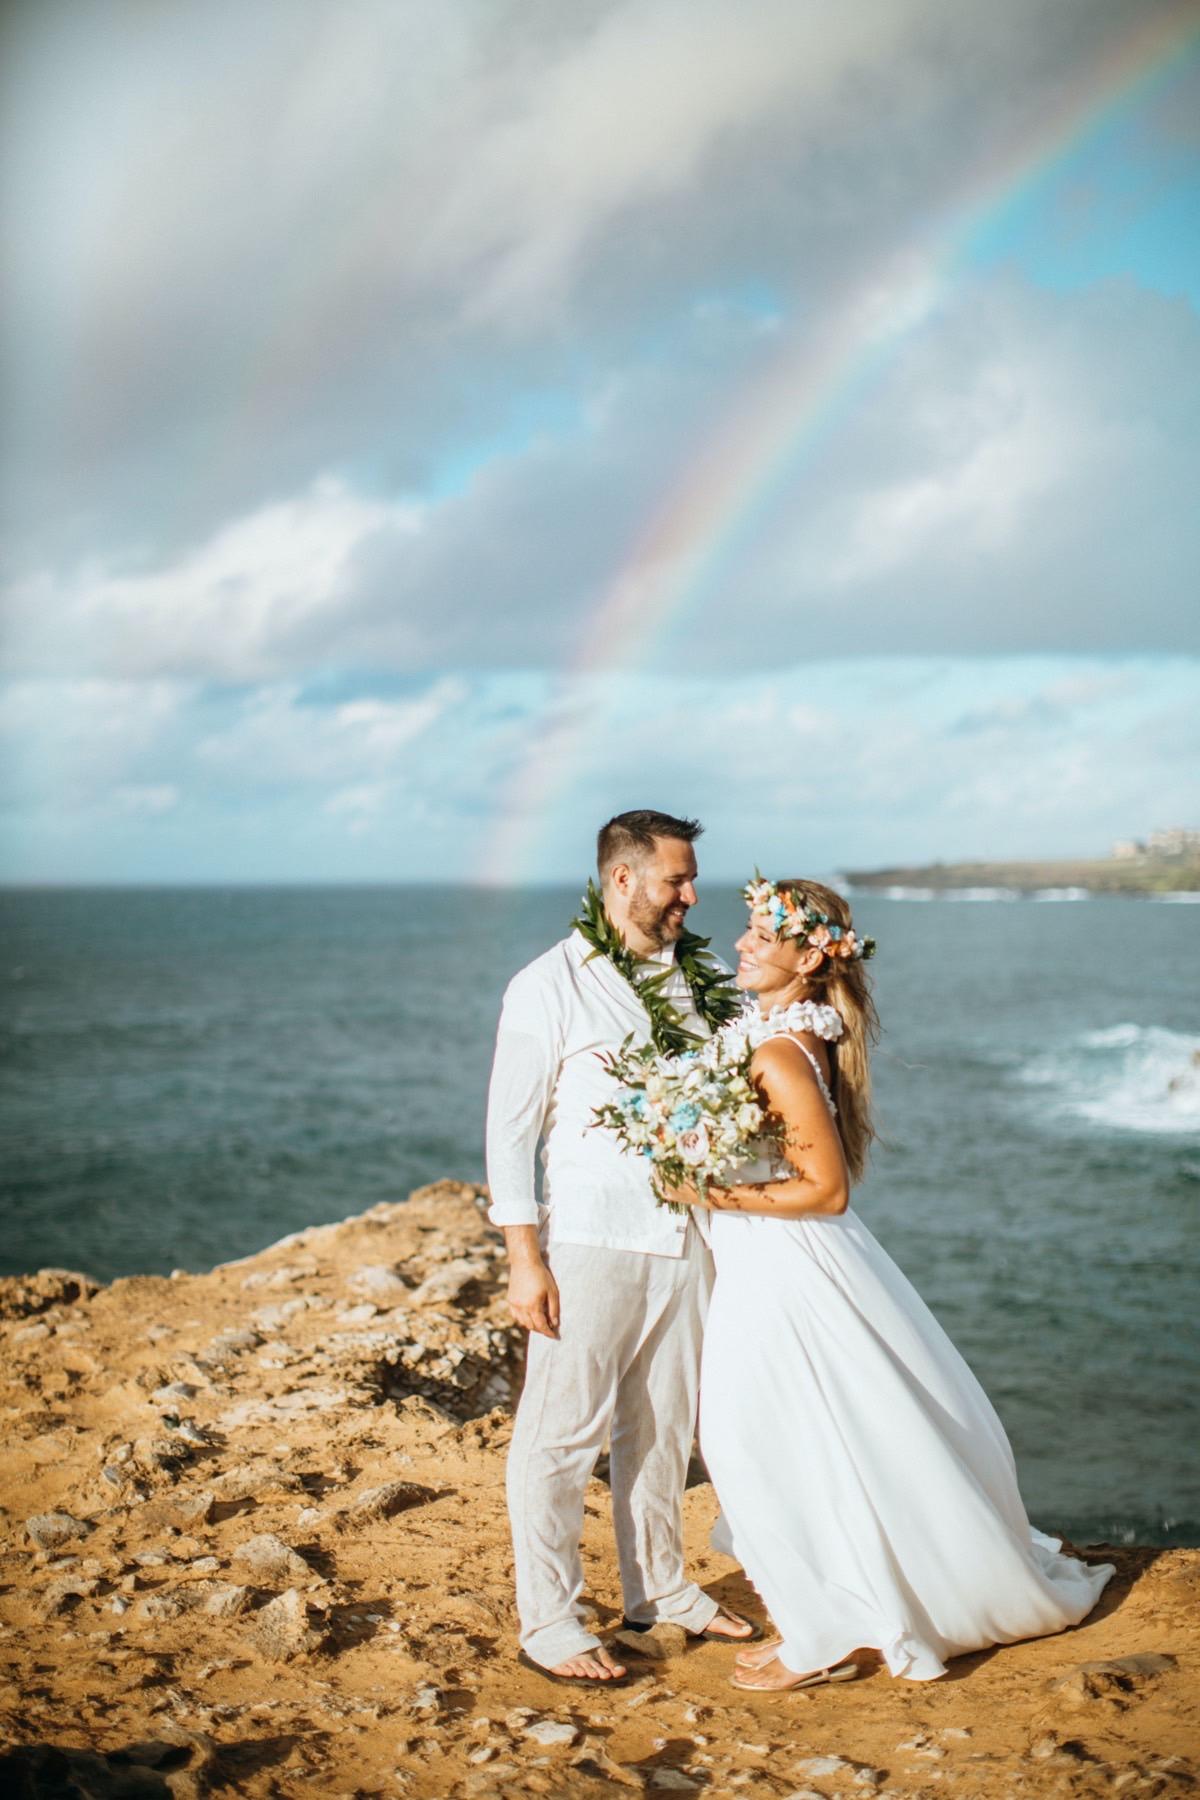 Michael & Ashley on the beach in Hawaii.